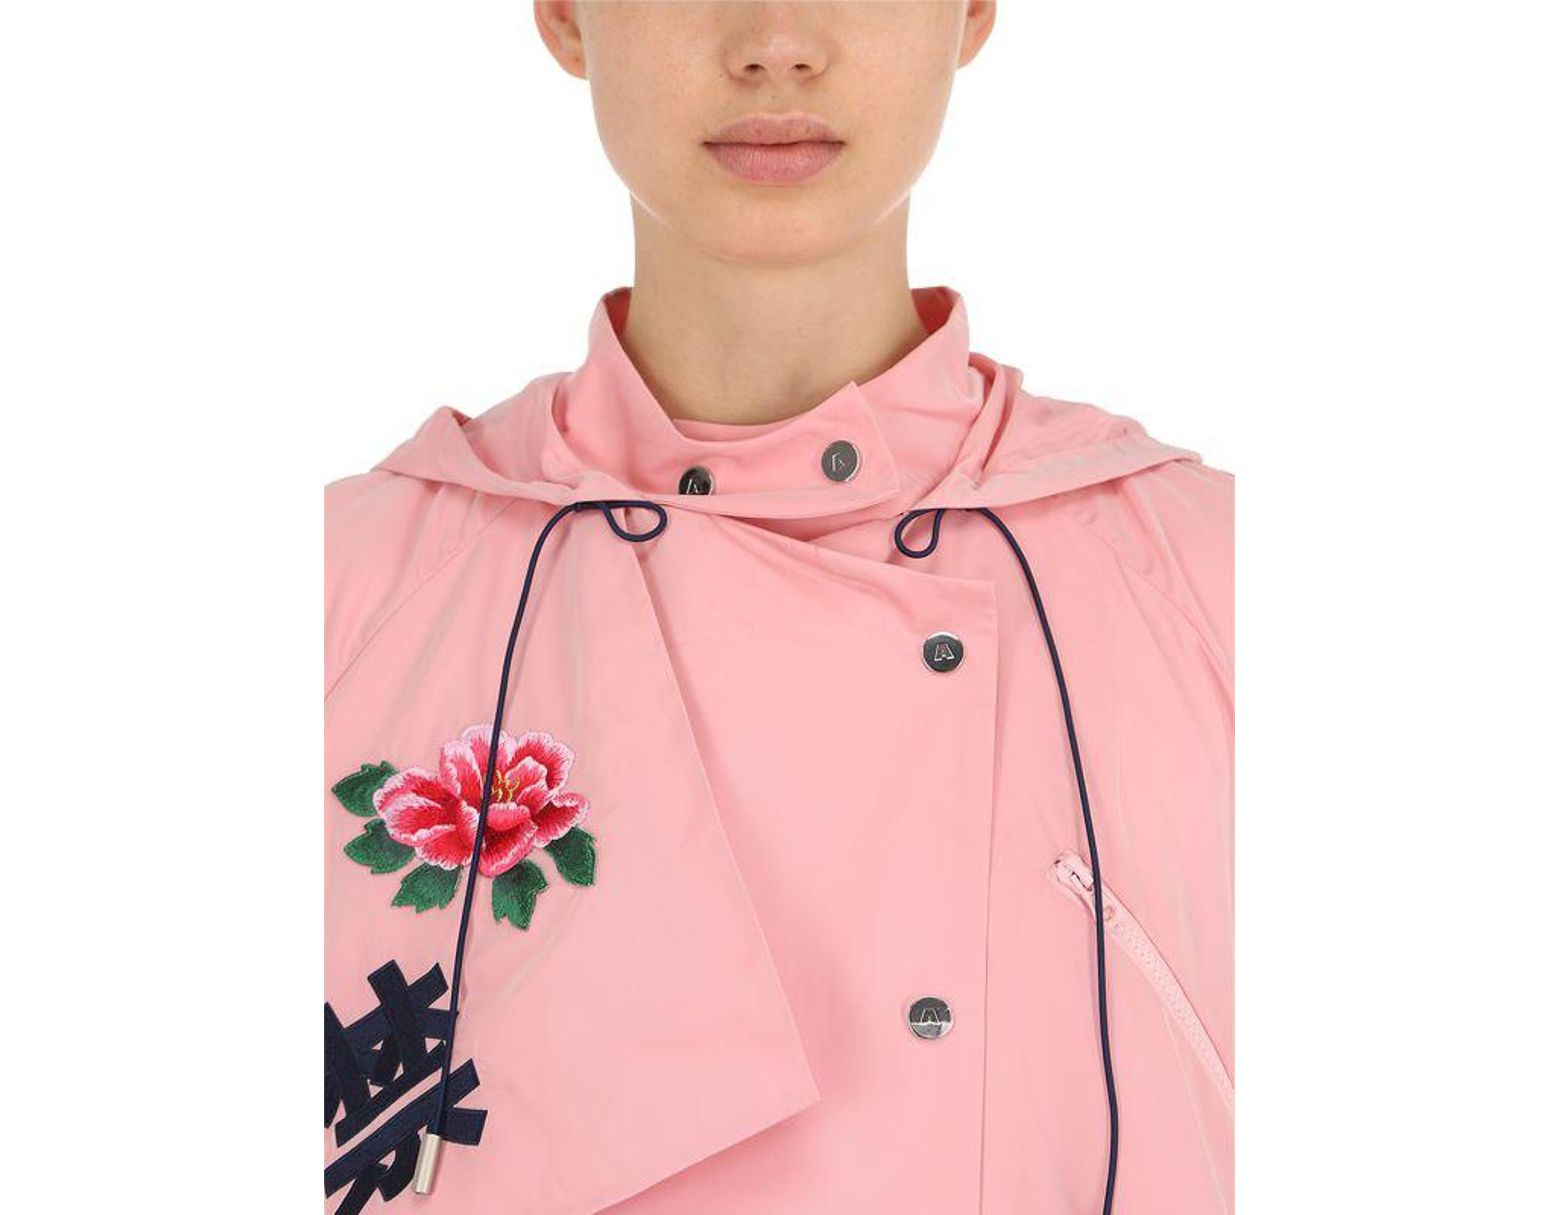 347e3cea8 Angel Chen Tokko Embroidered Windbreaker Coat in Pink - Lyst